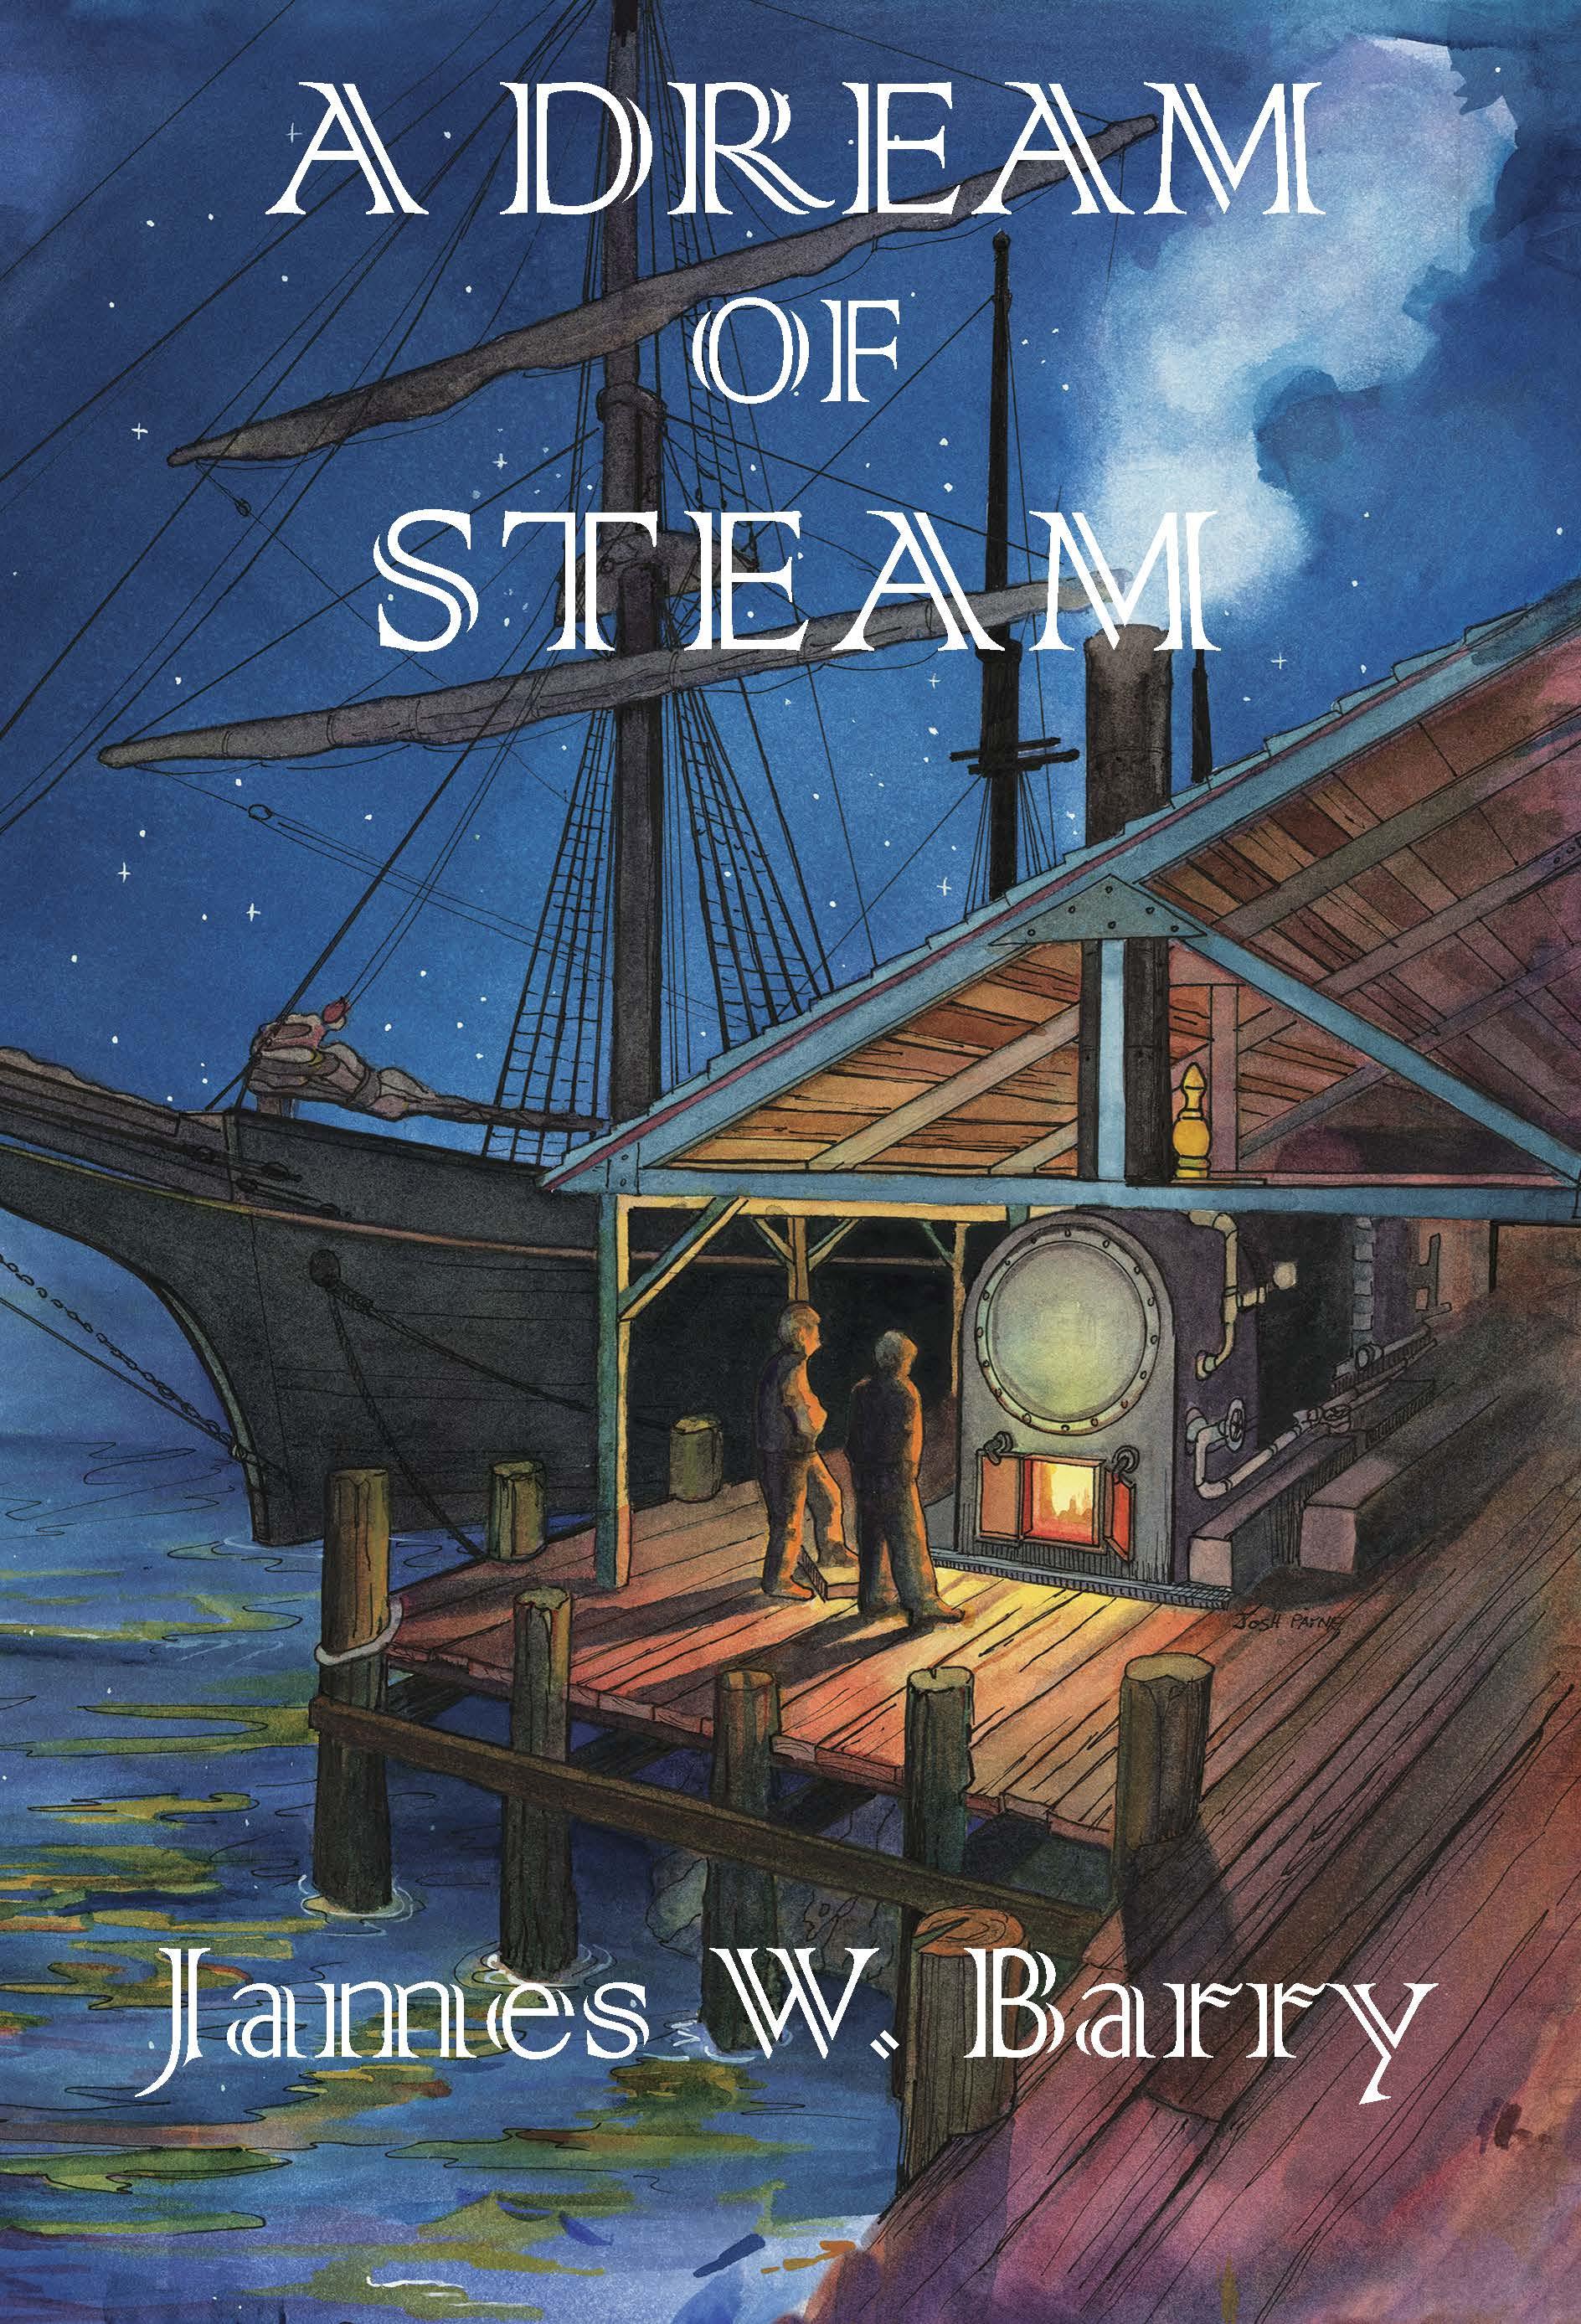 DreamOfSteam-eBookCover